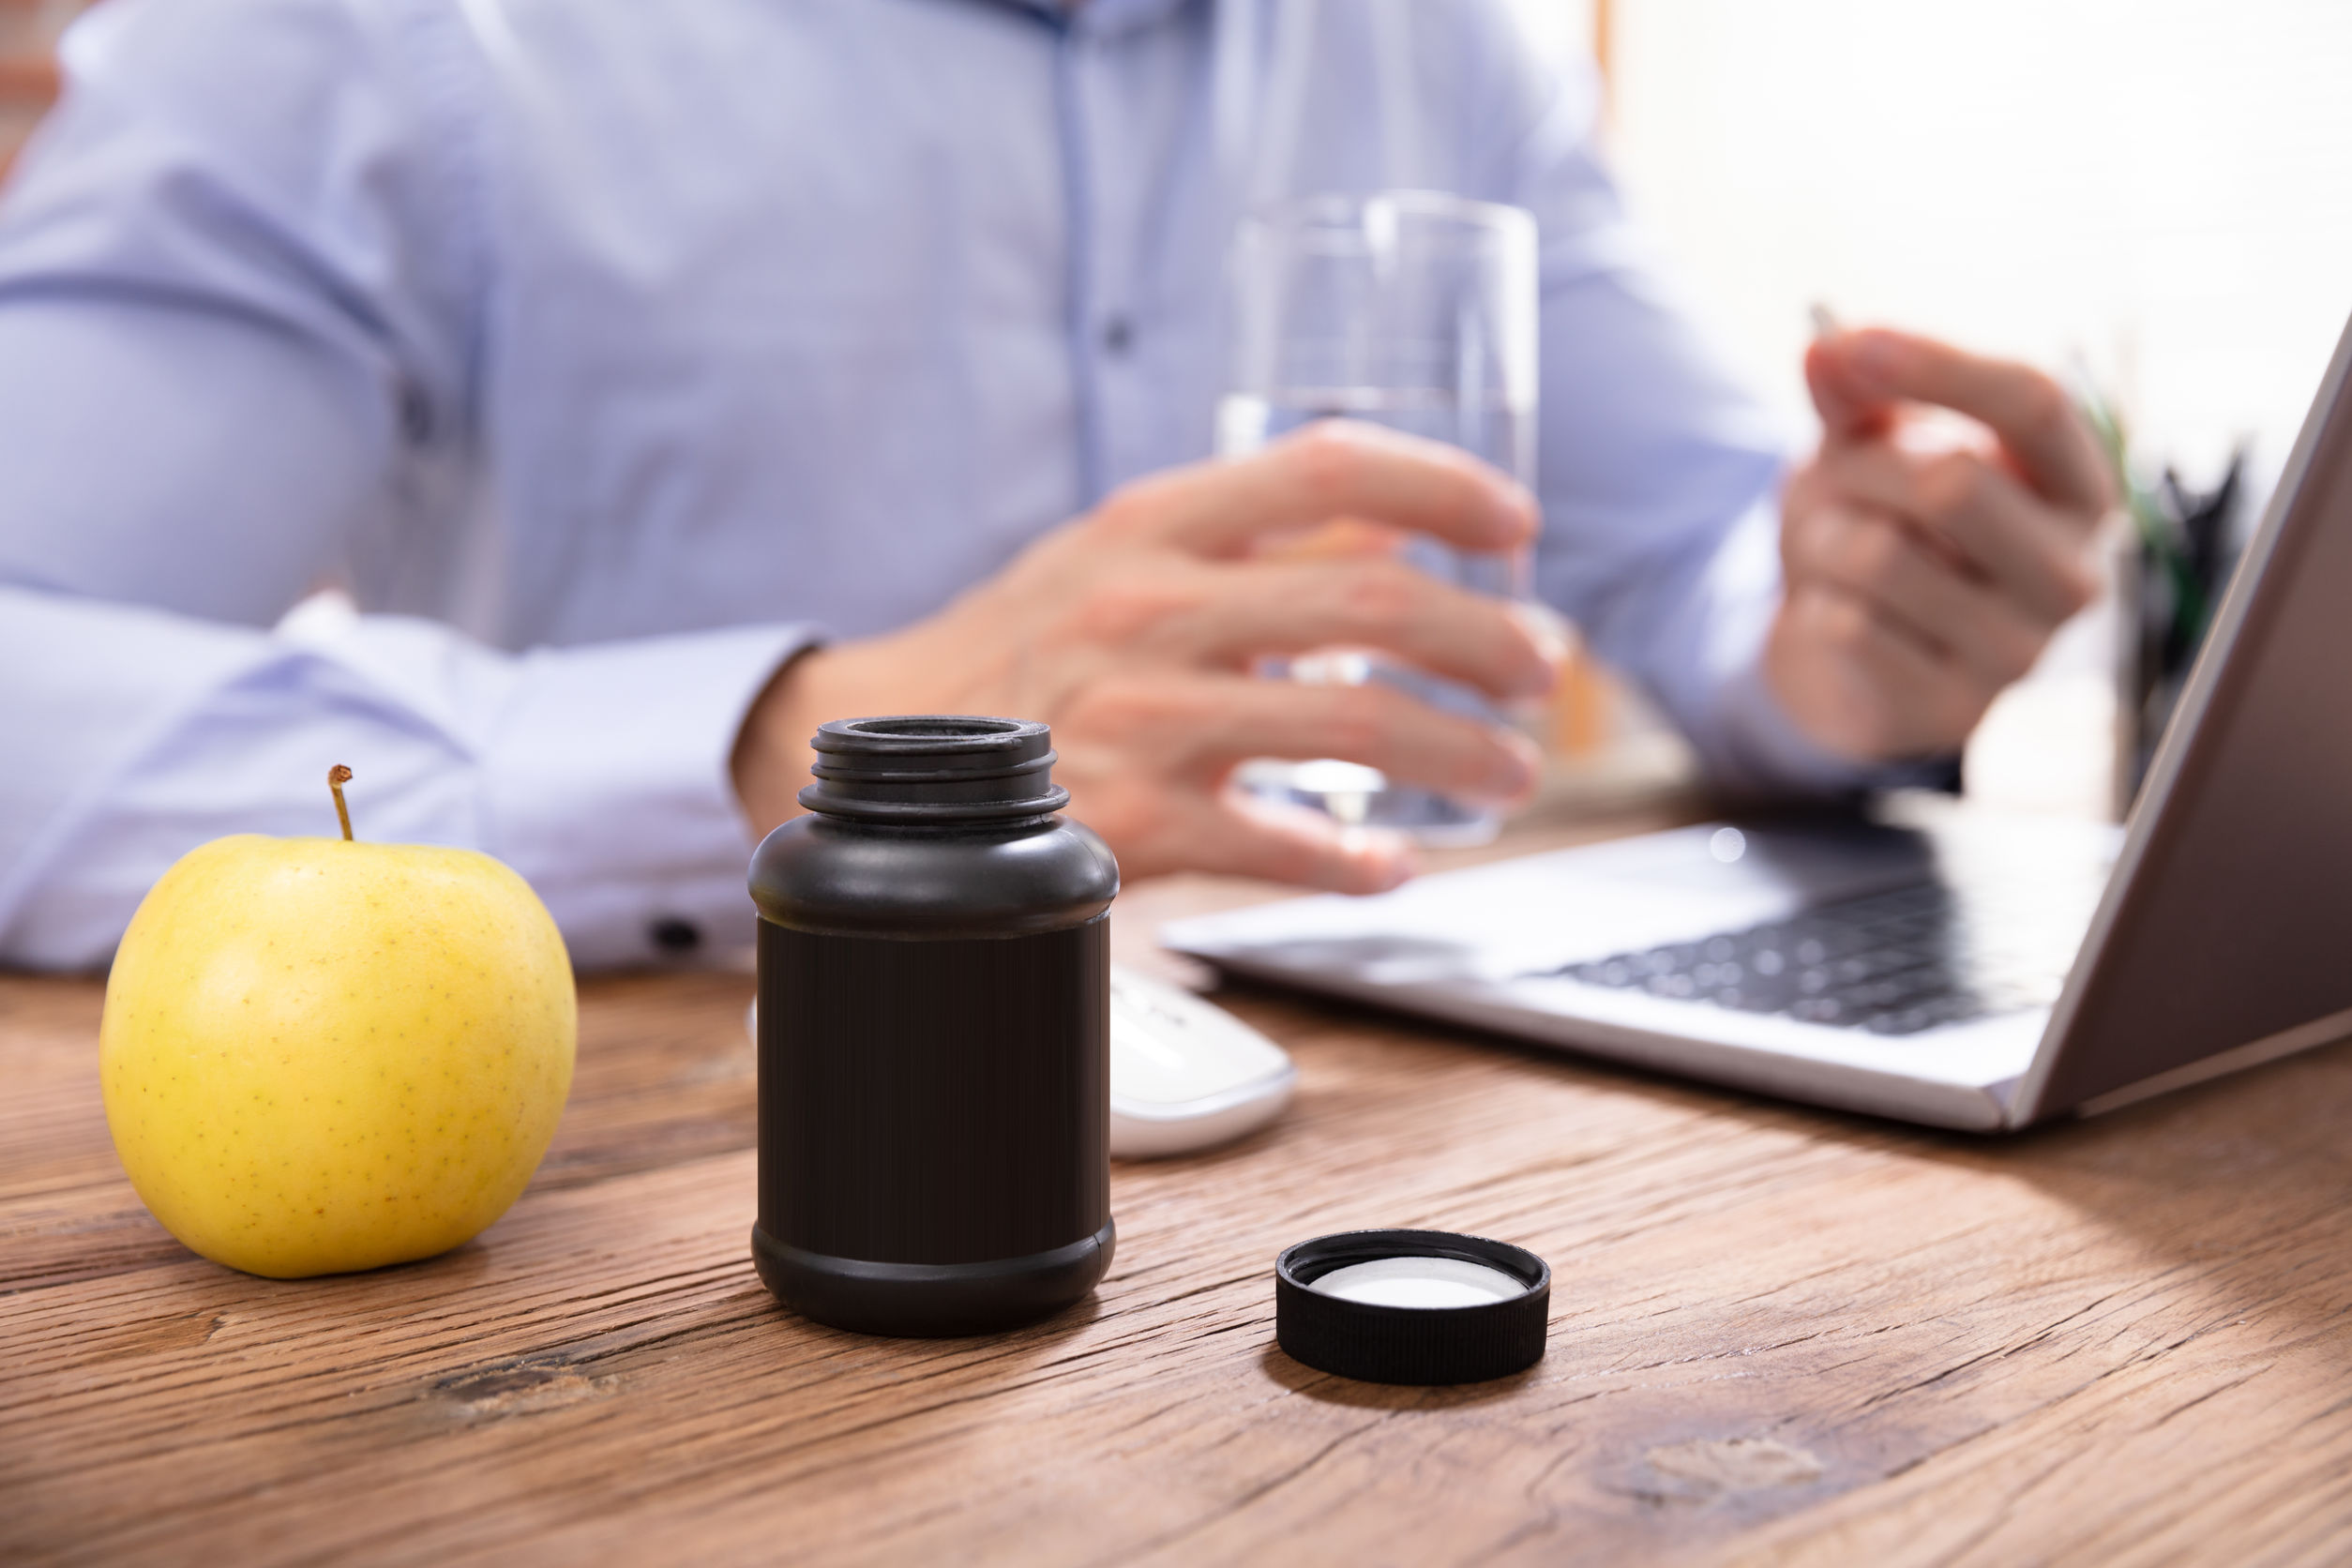 Magnesium Malat: Test, Wirkung, Anwendung & Studien (09/21)